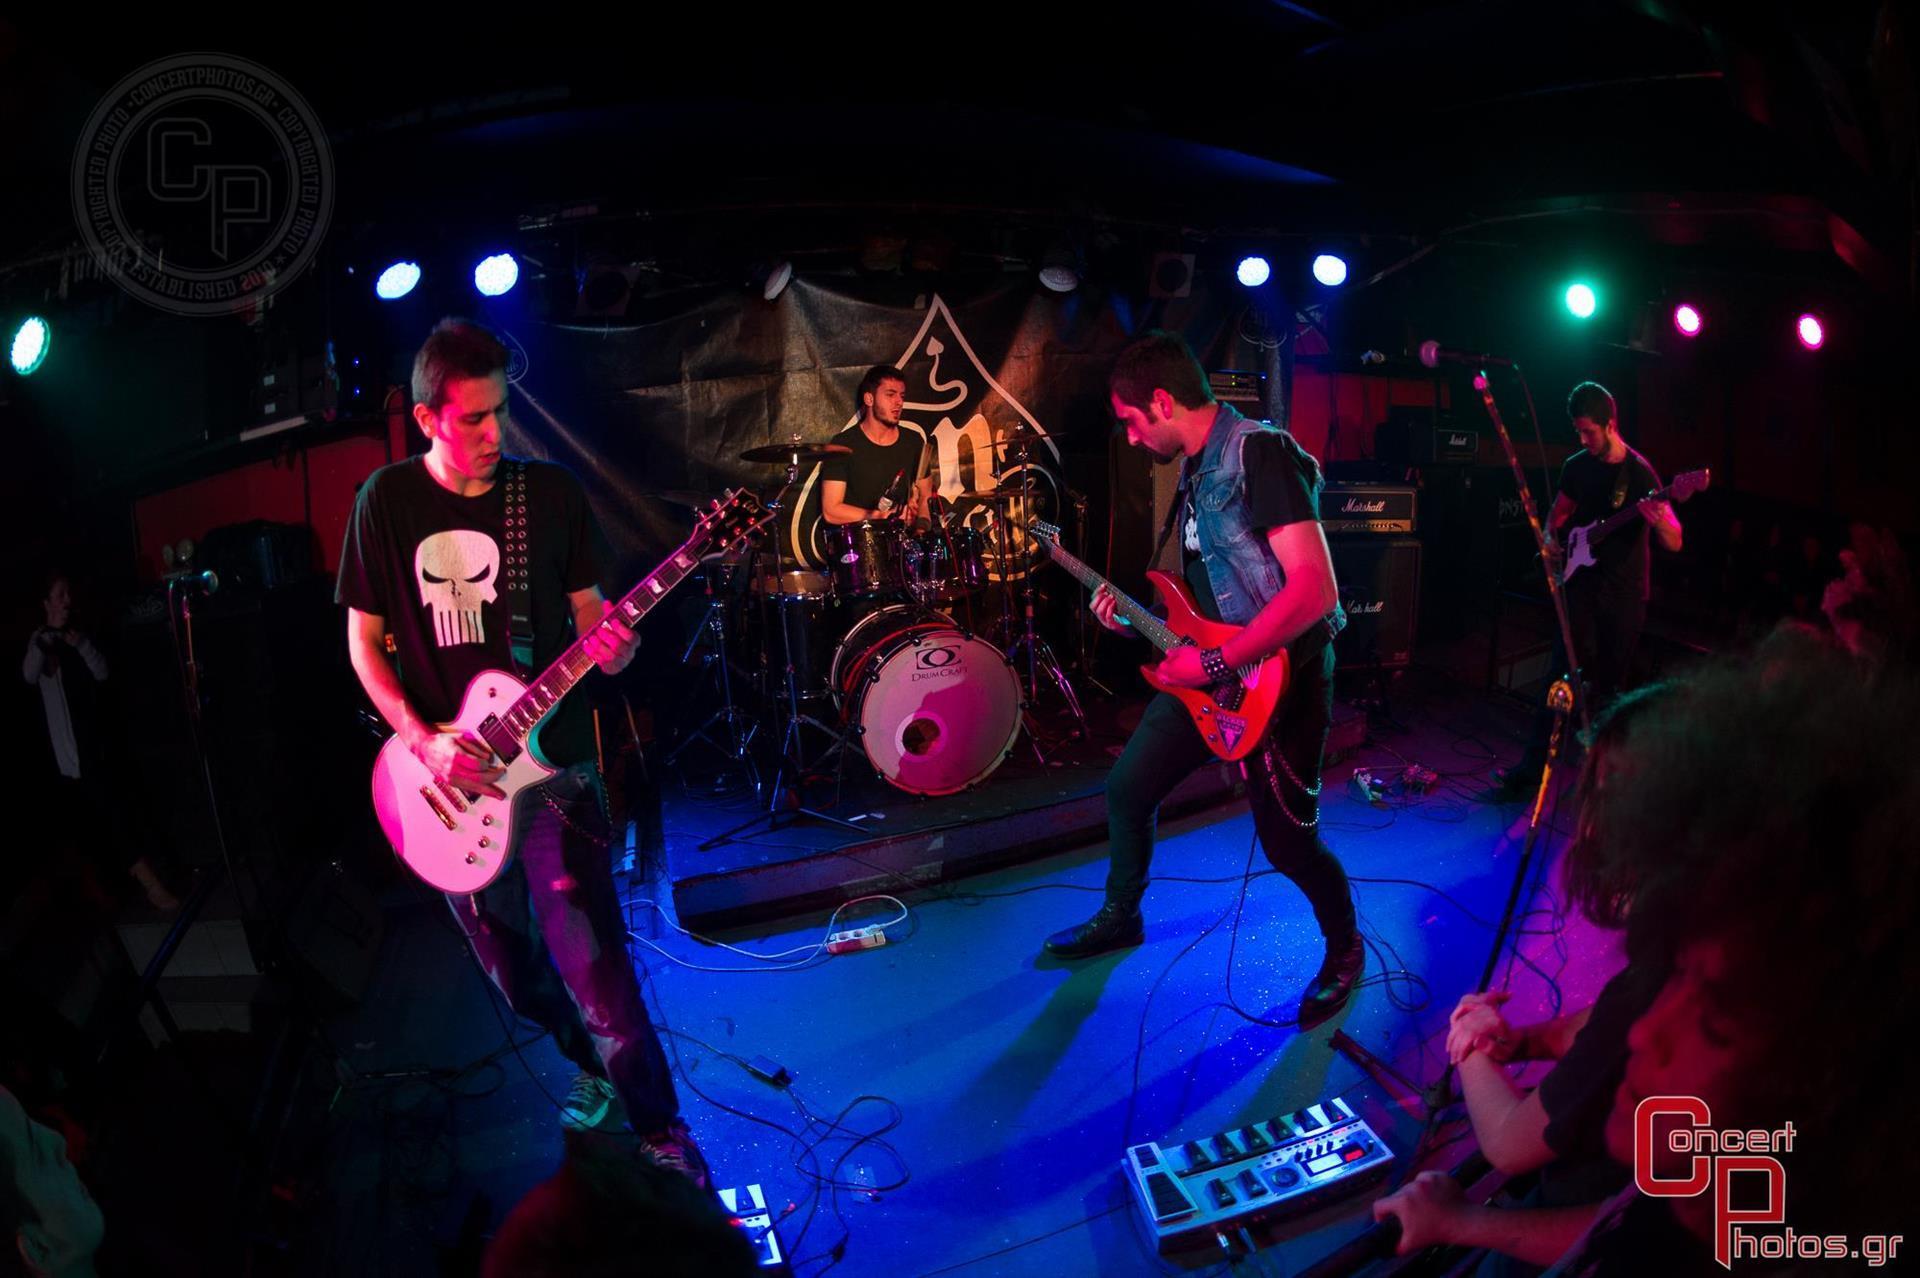 Battle Of The Bands Athens - Leg 3- photographer:  - ConcertPhotos - 20150104_2233_41